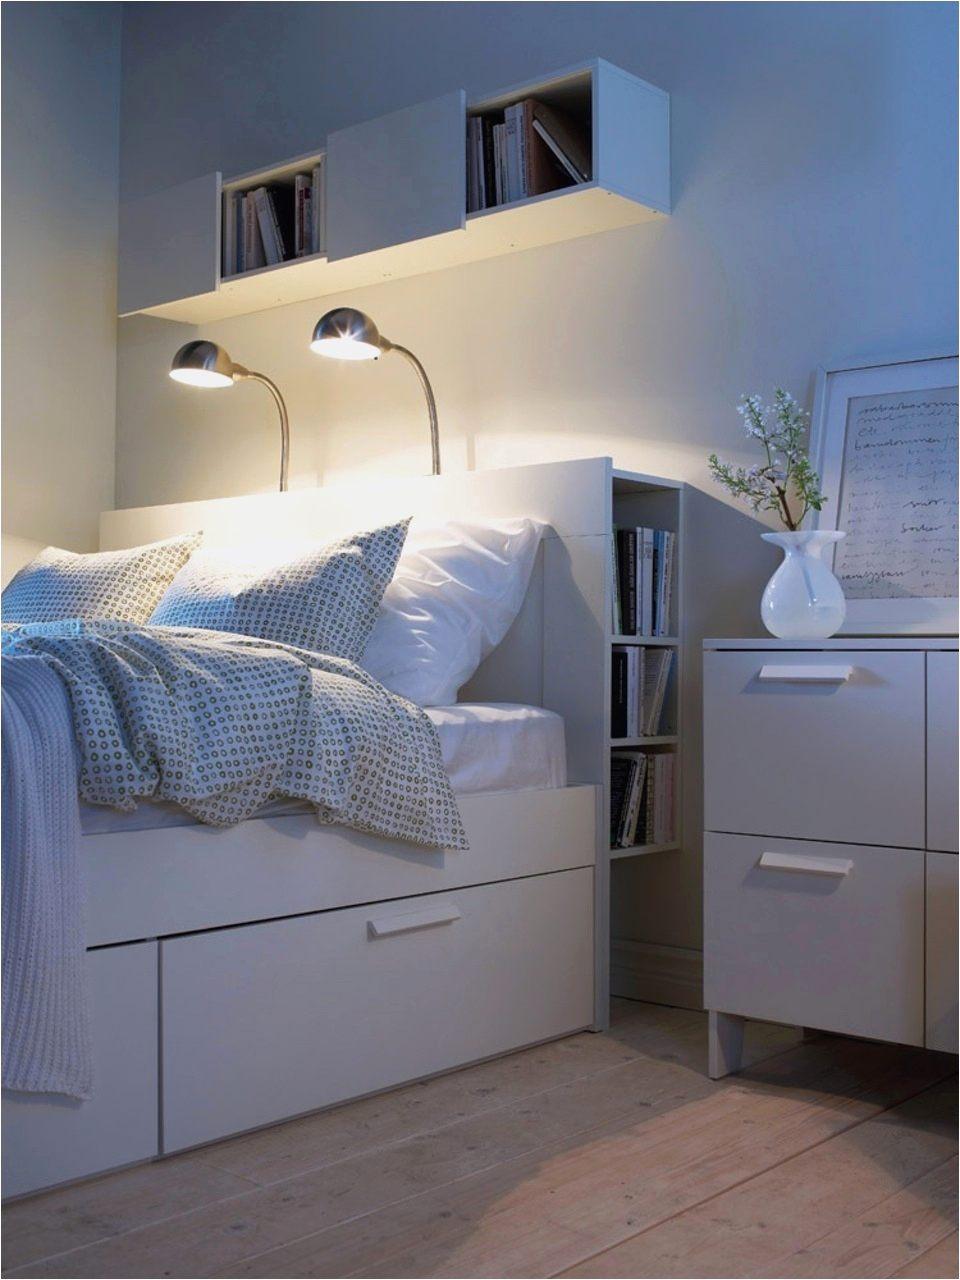 Lit Brimnes Ikea élégant Matelas 160—200 Ikea Elegant Malvik Madrac